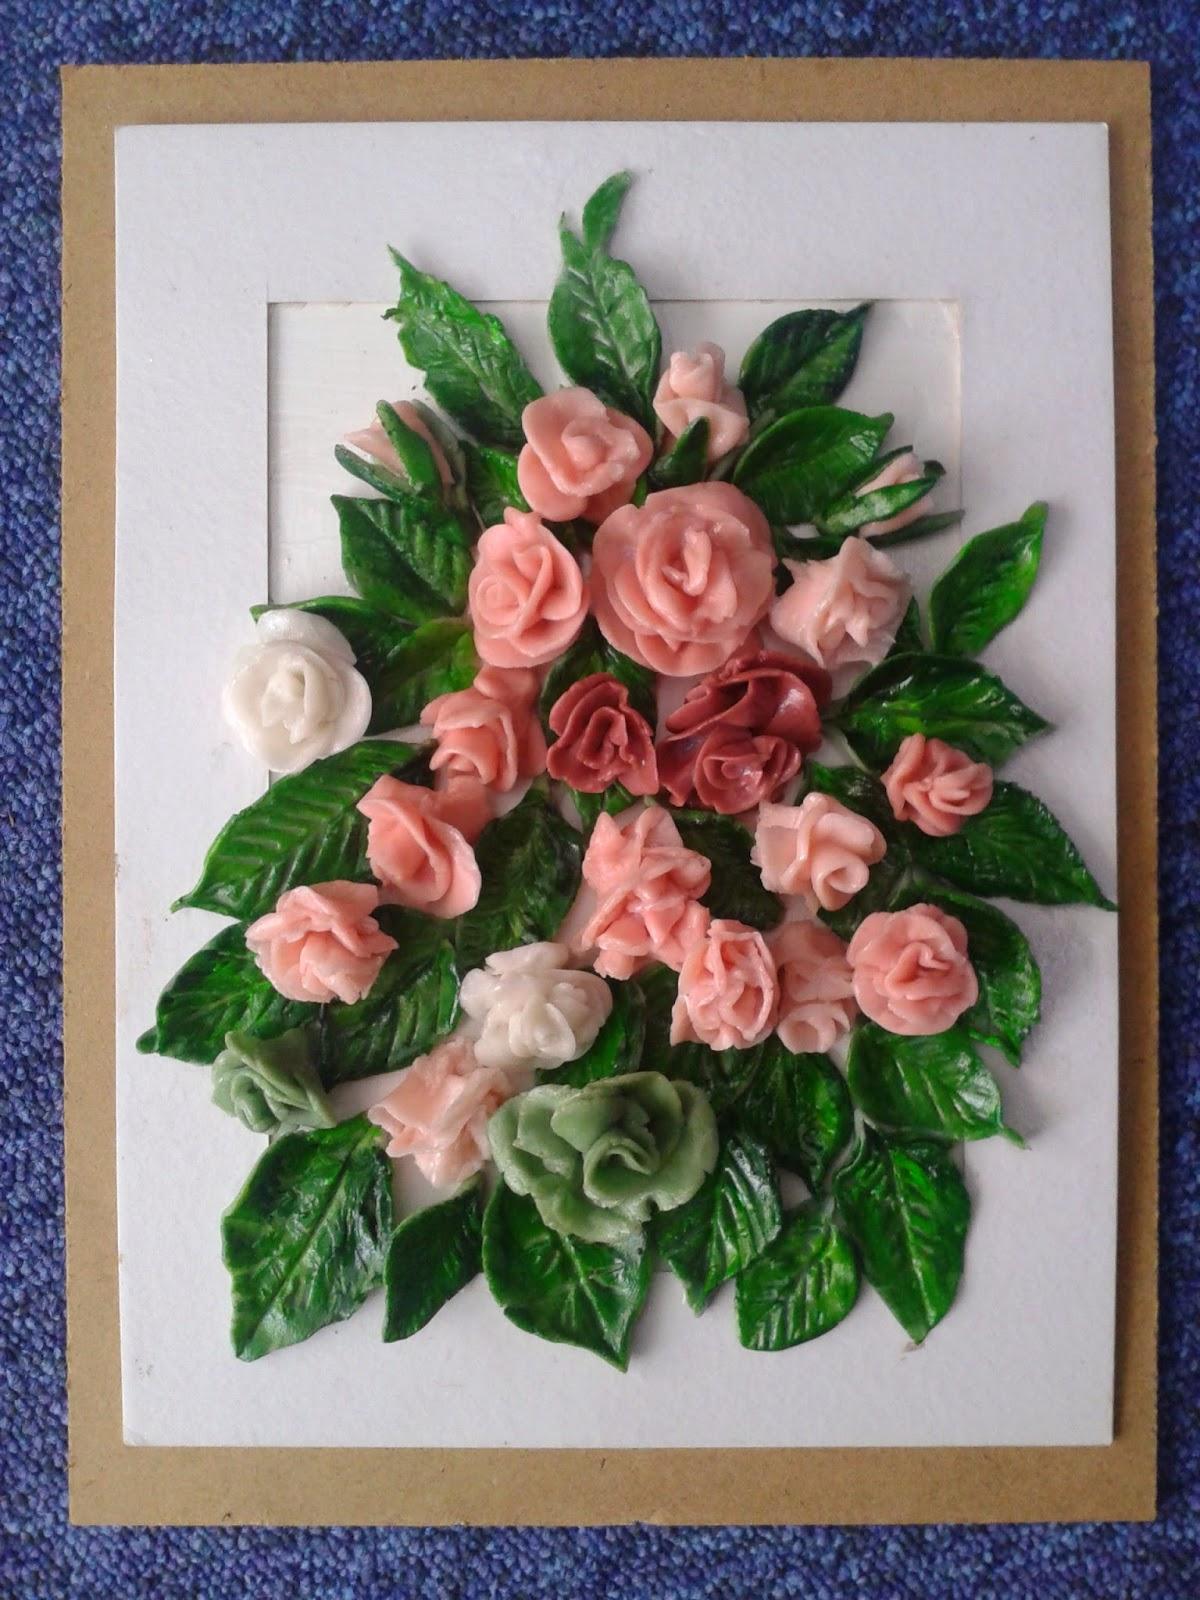 obrazy, różę z zimnej porcelany